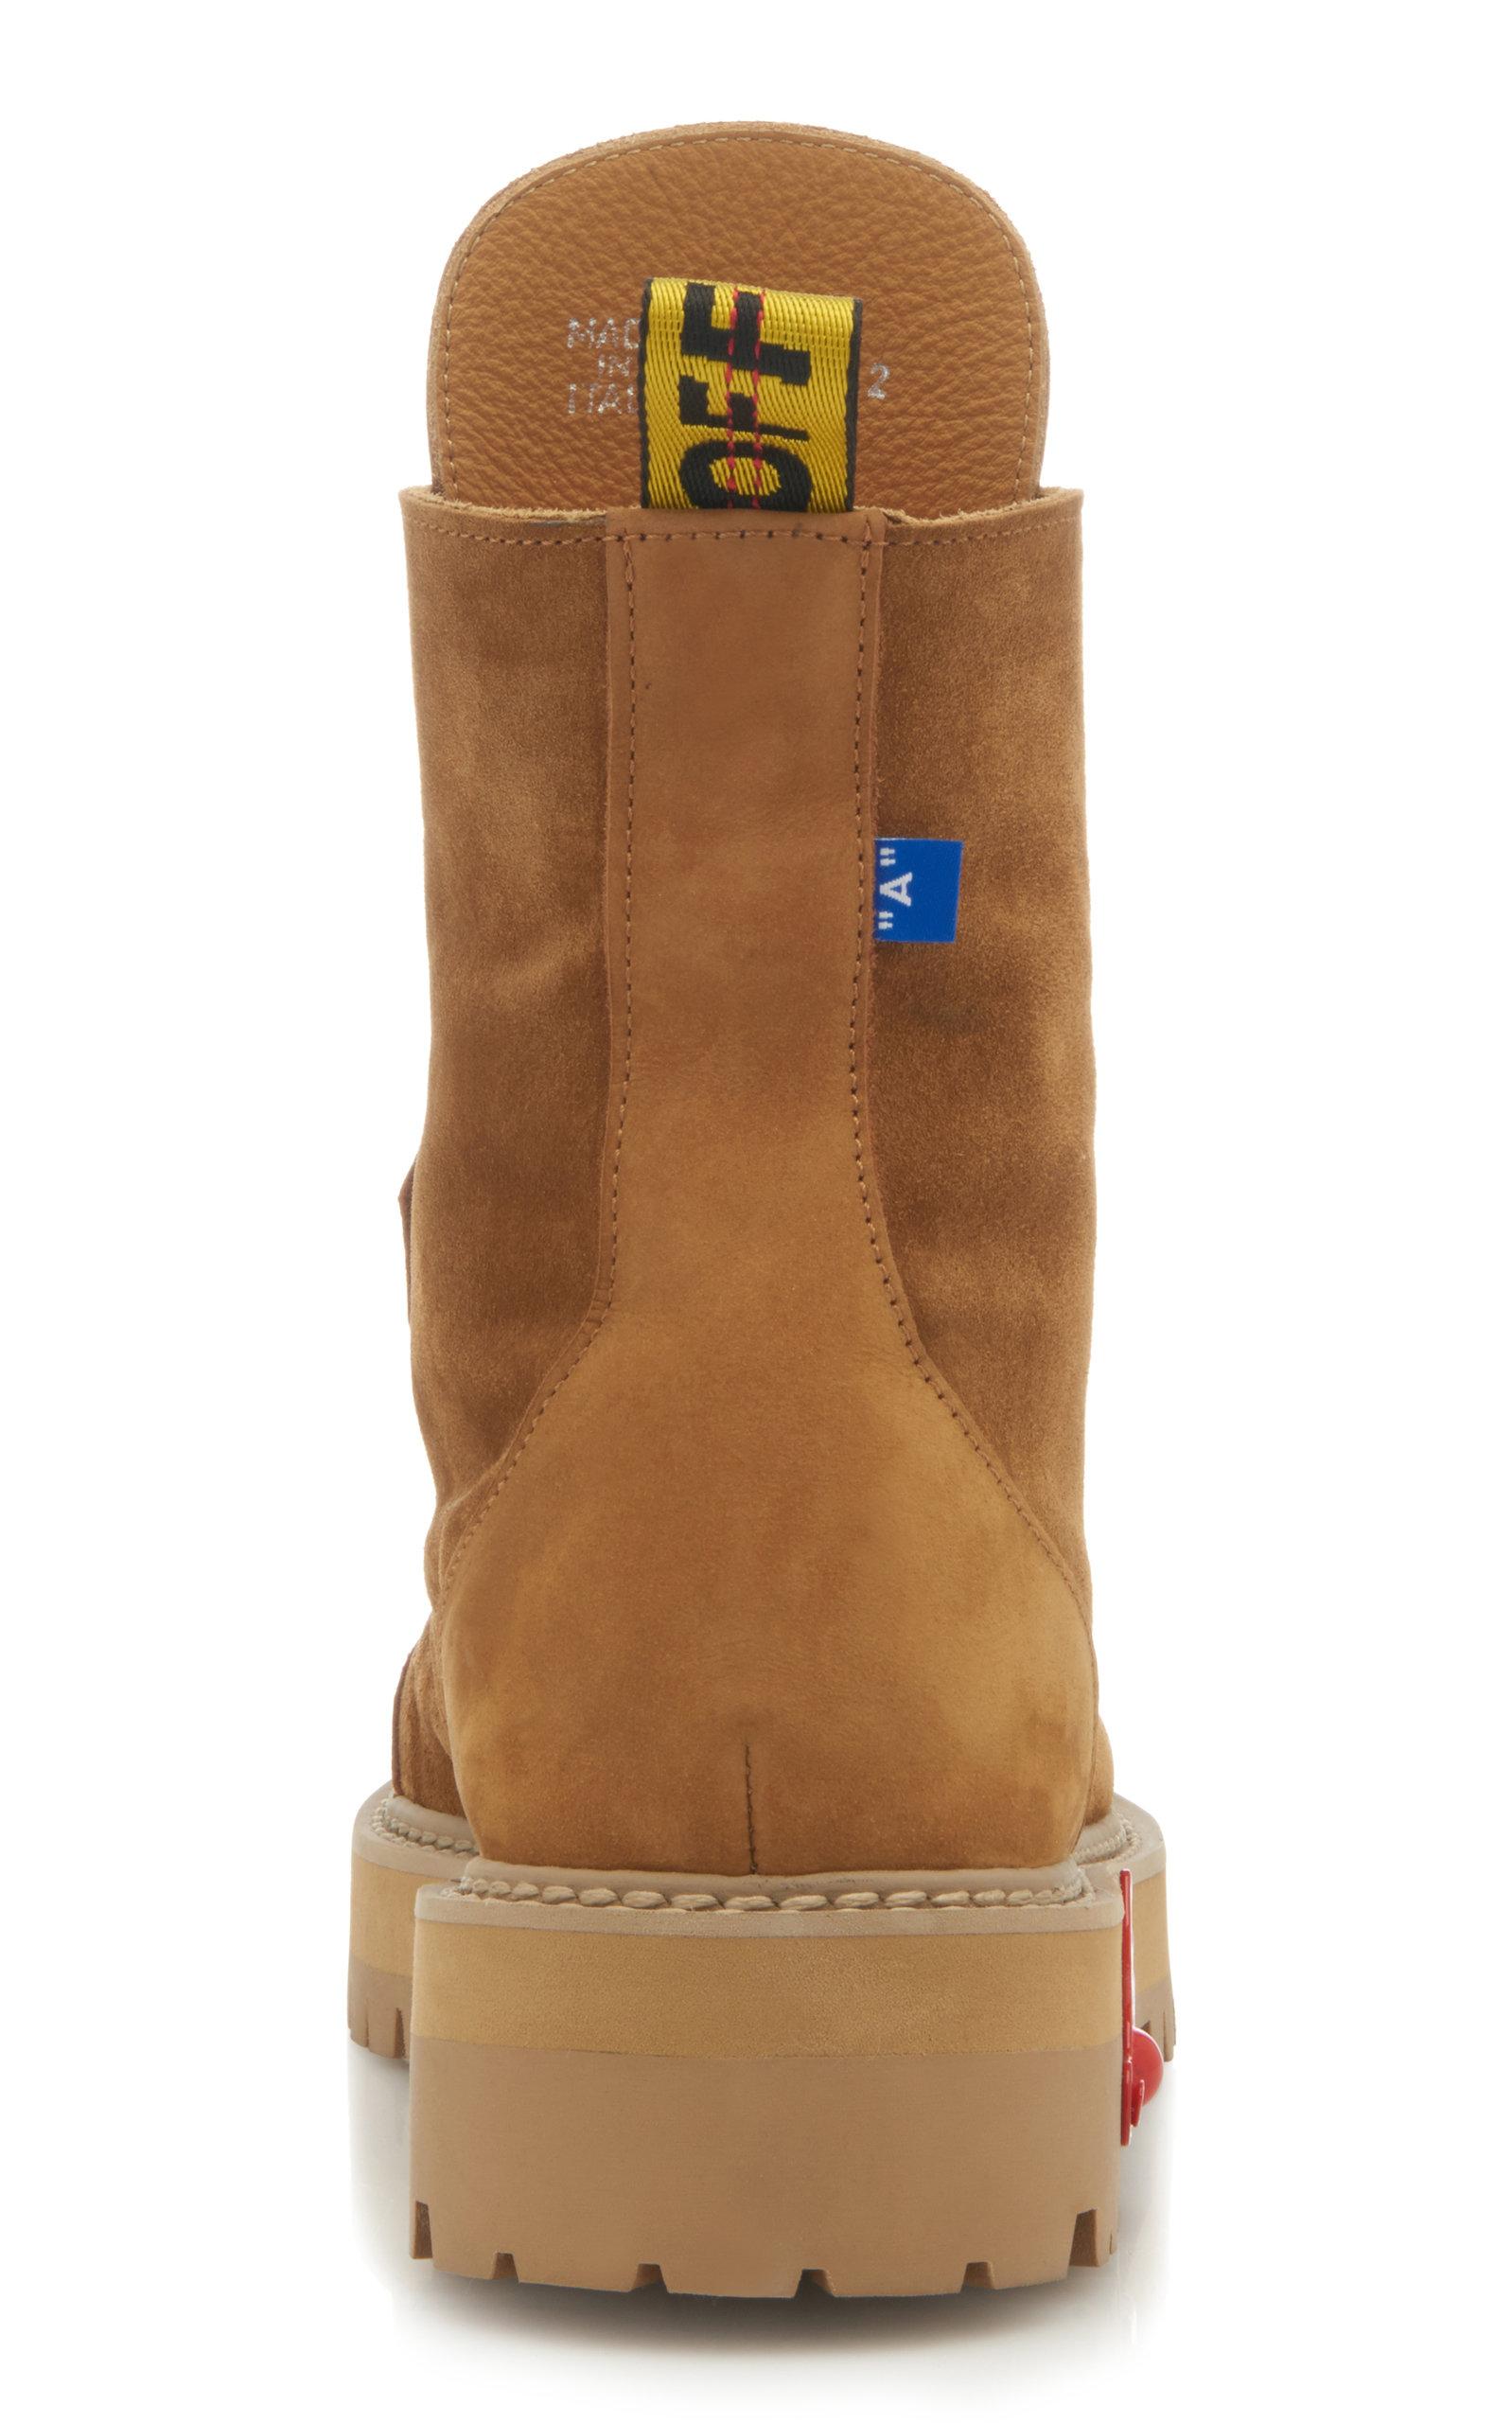 59719250d2b31 Off-White c/o Virgil AblohSuede Hiking Boots. CLOSE. Loading. Loading.  Loading. Loading